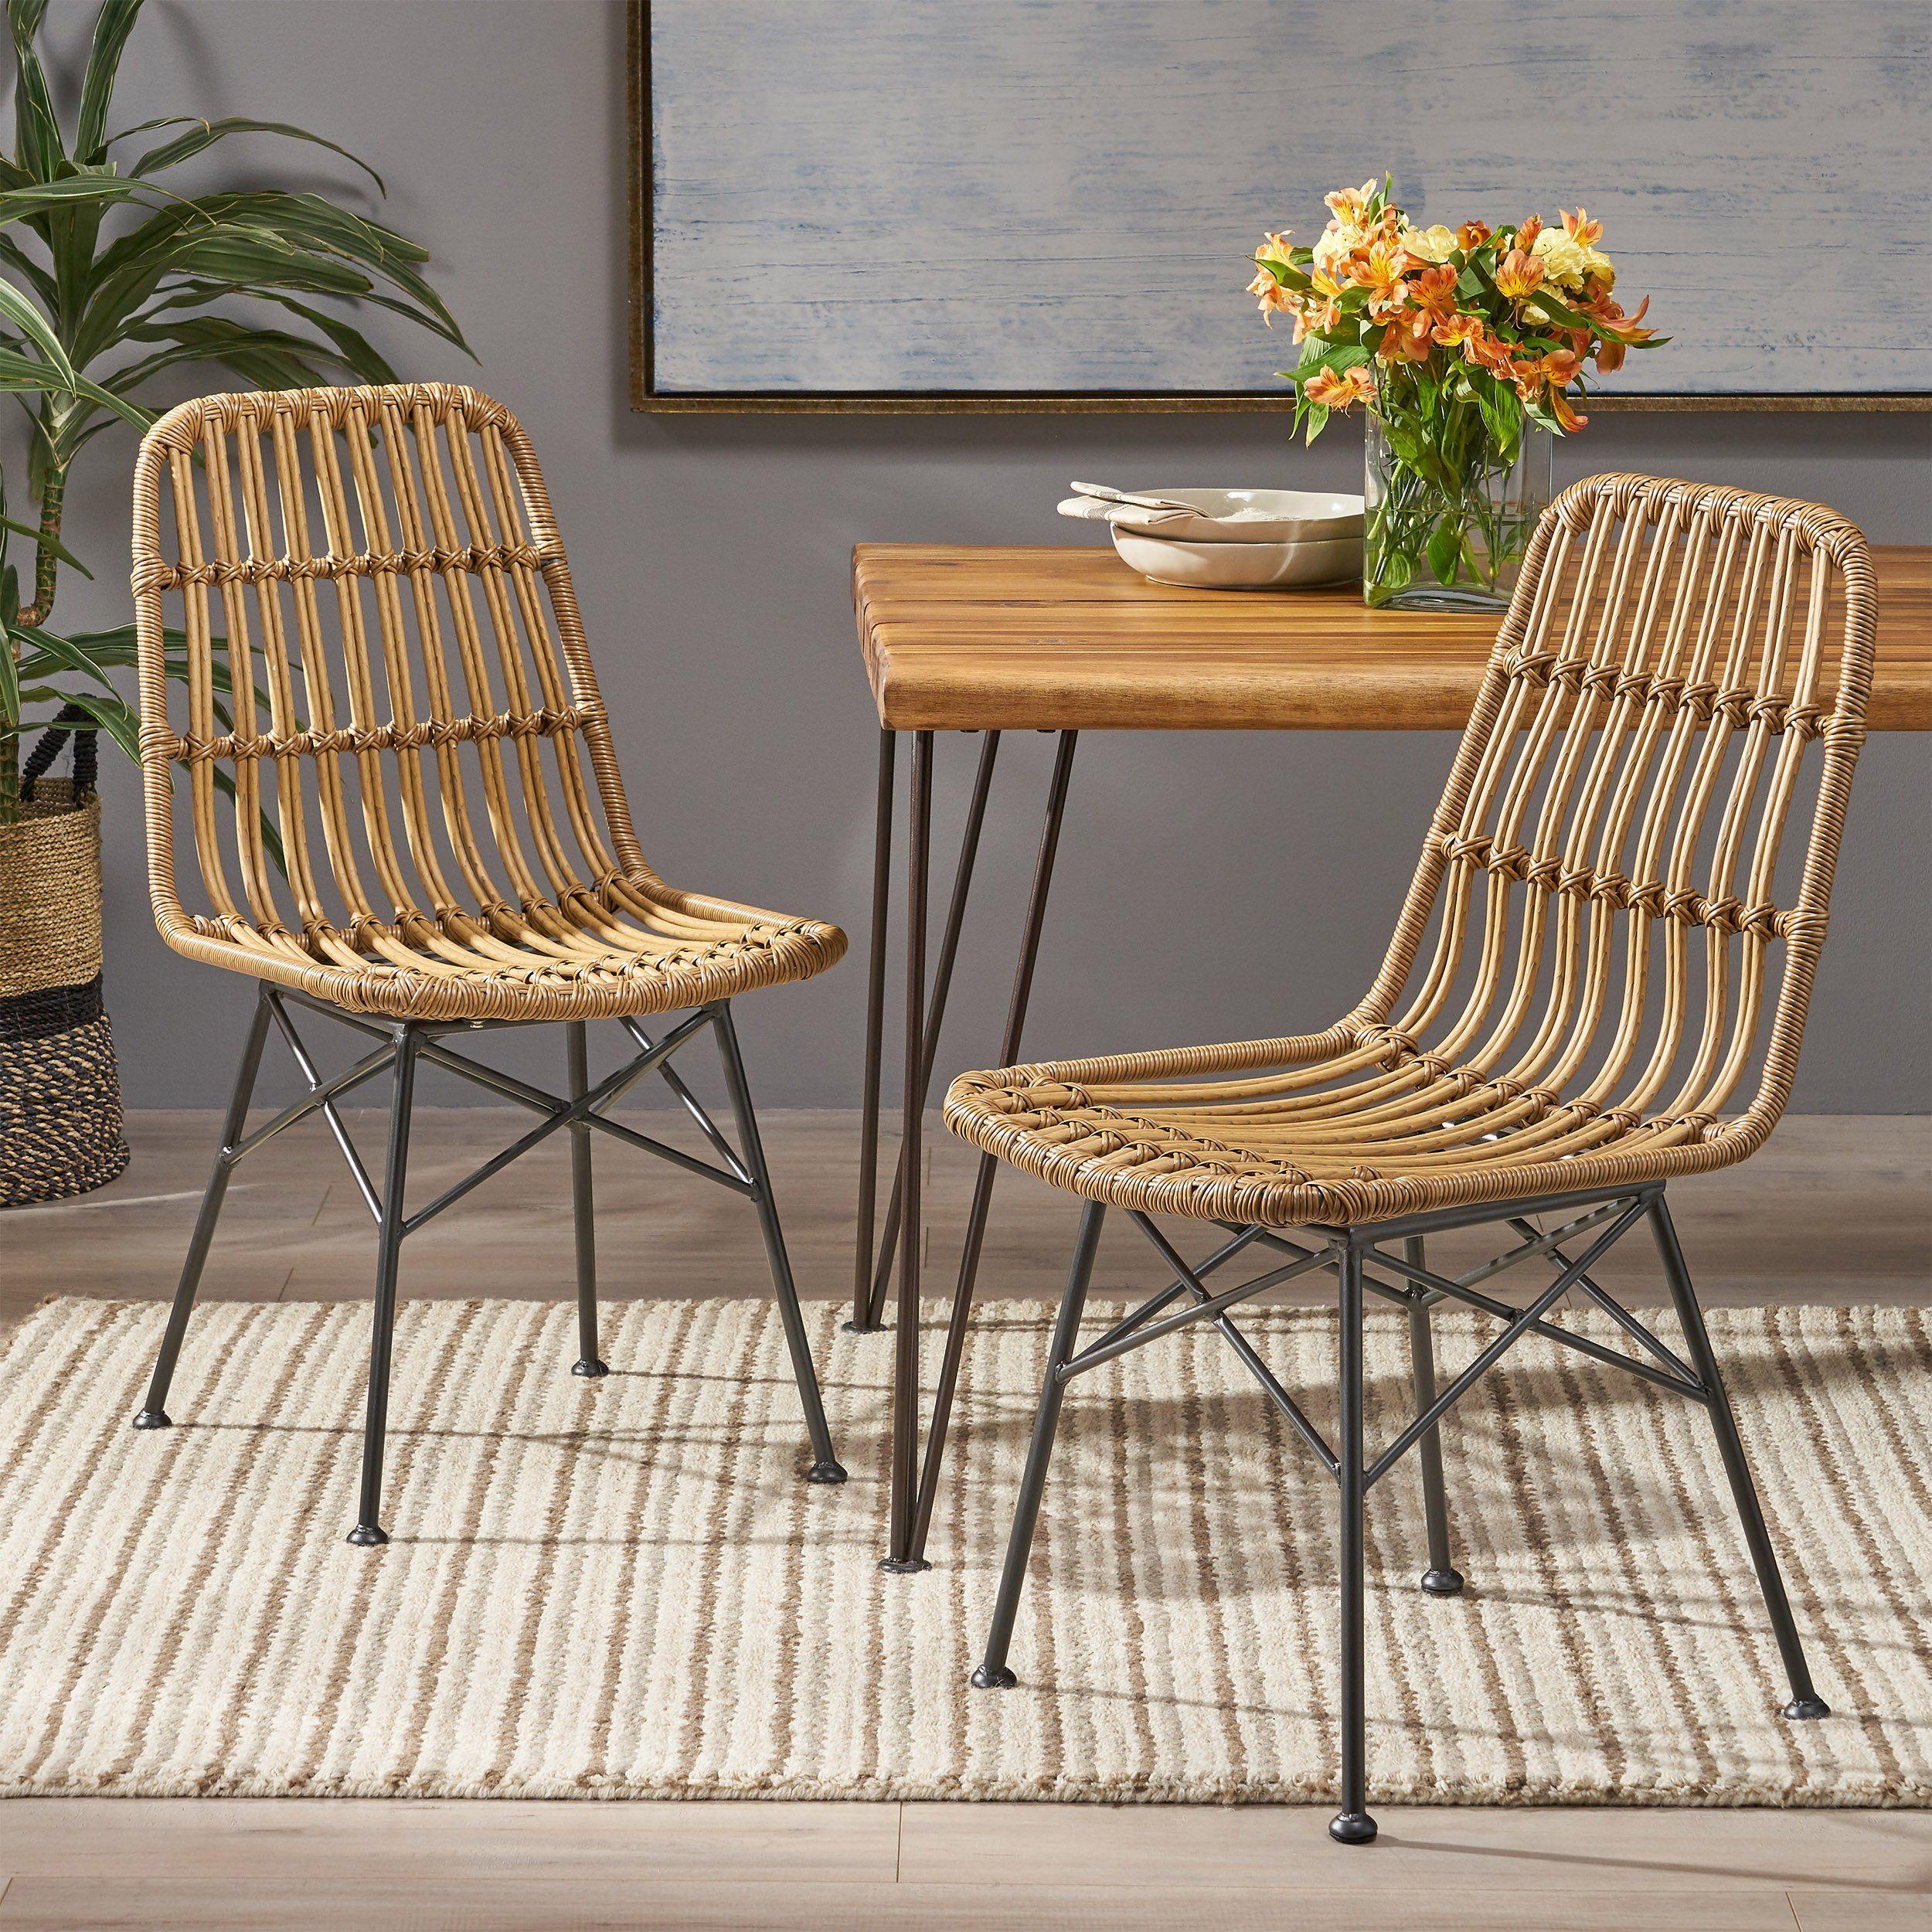 Silverdew Indoor Wicker Dining Chairs (Set of 2) - Light Brown